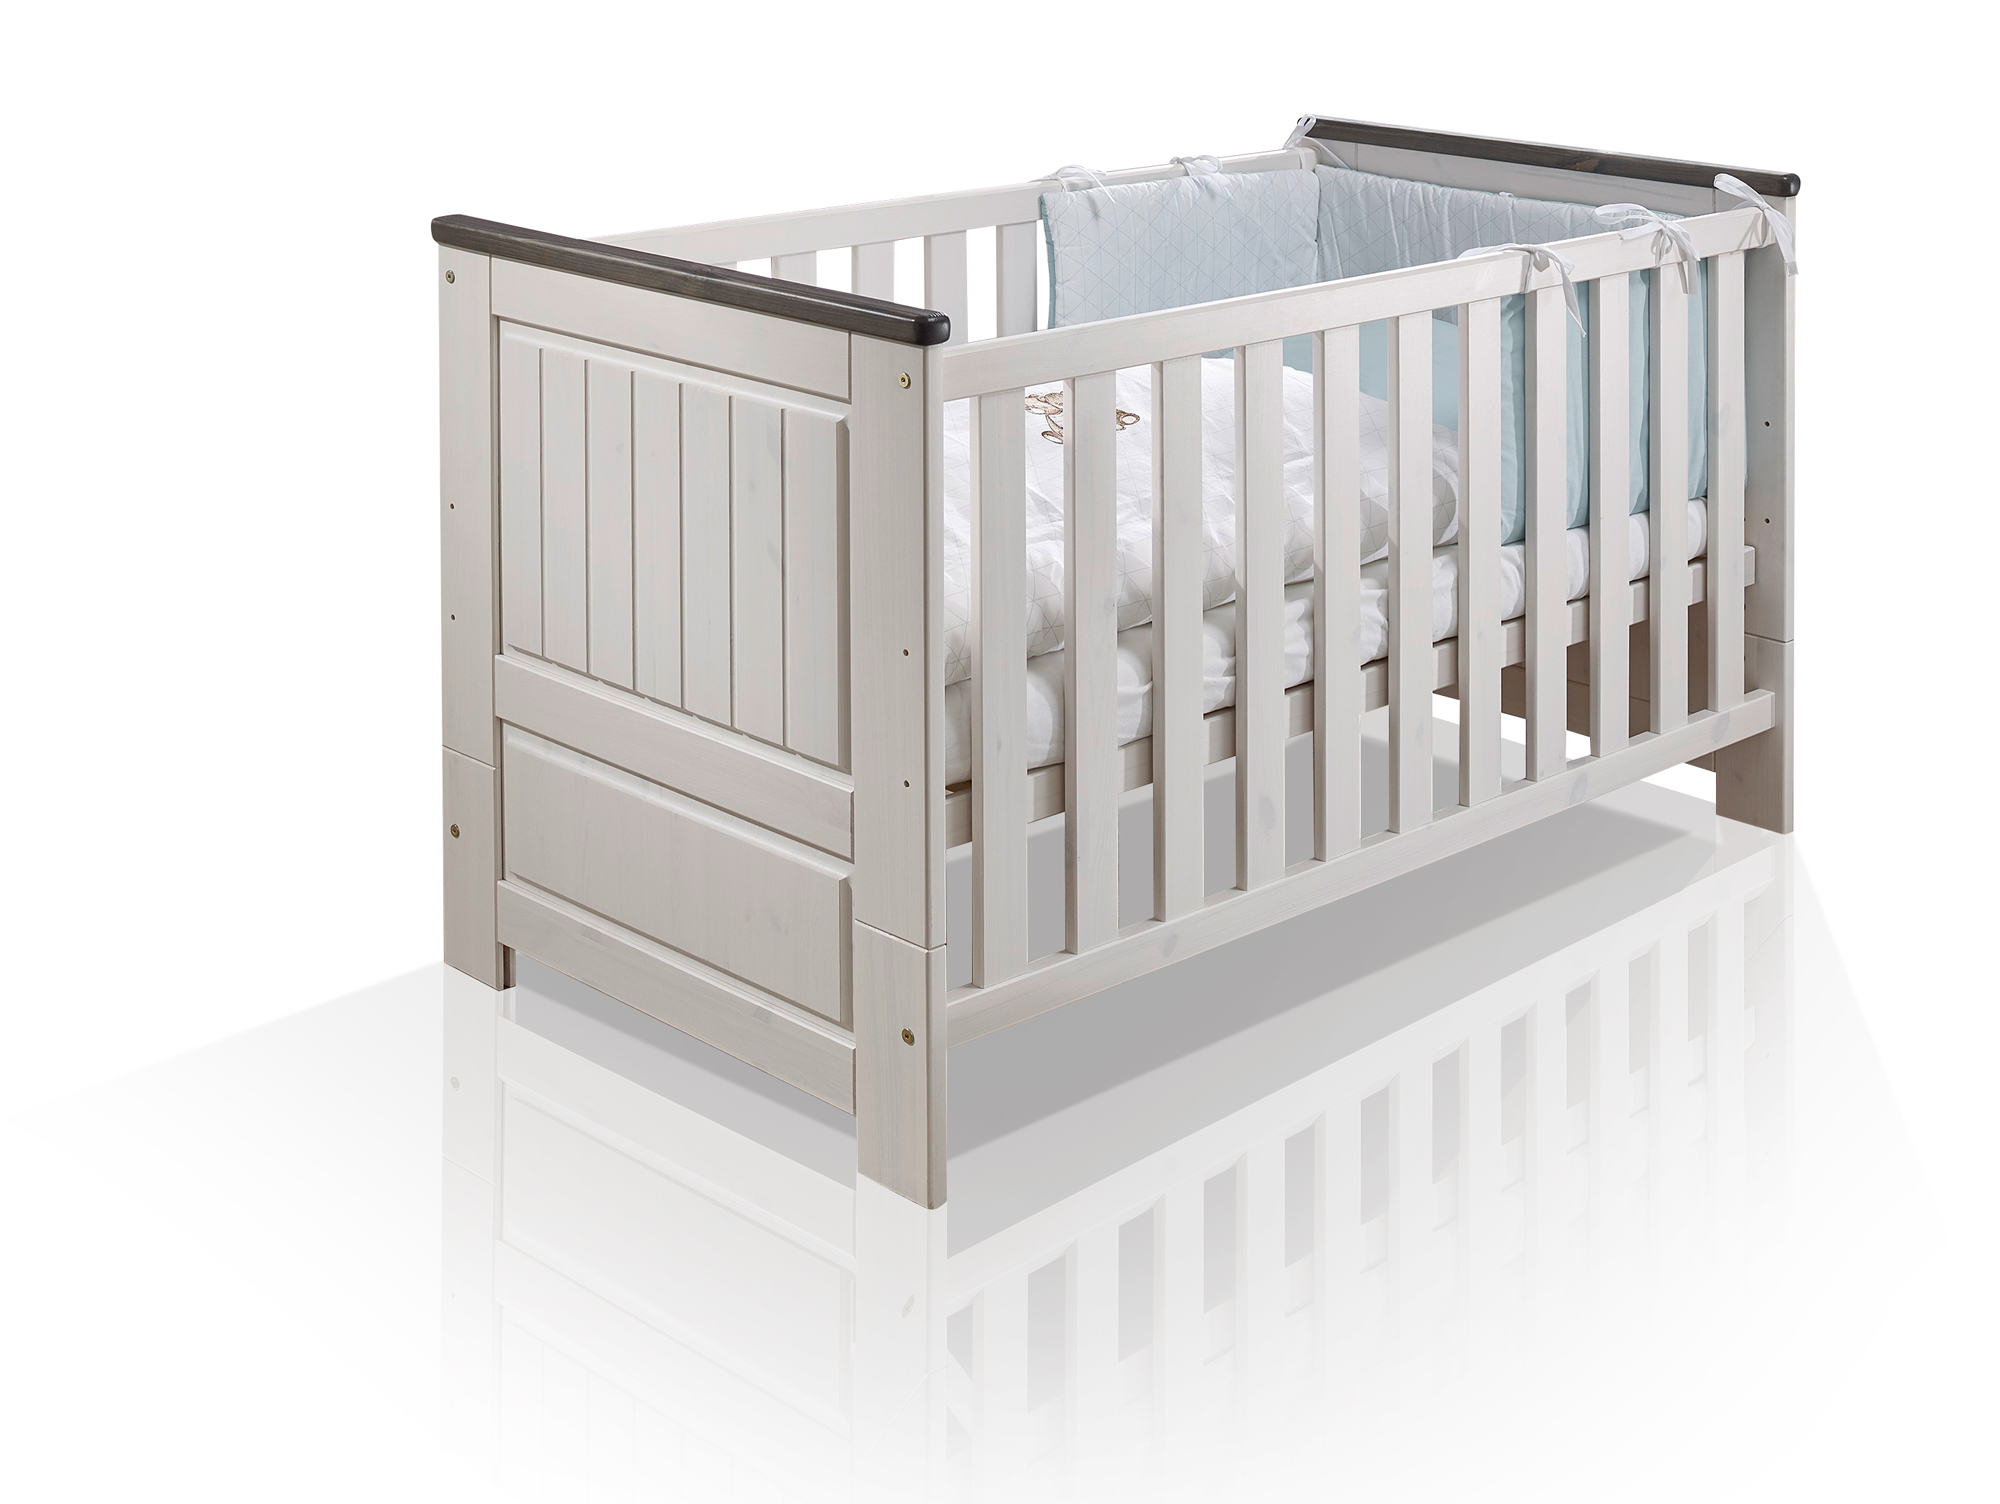 tinka babybett 70x140 cm kiefer weiss grau. Black Bedroom Furniture Sets. Home Design Ideas